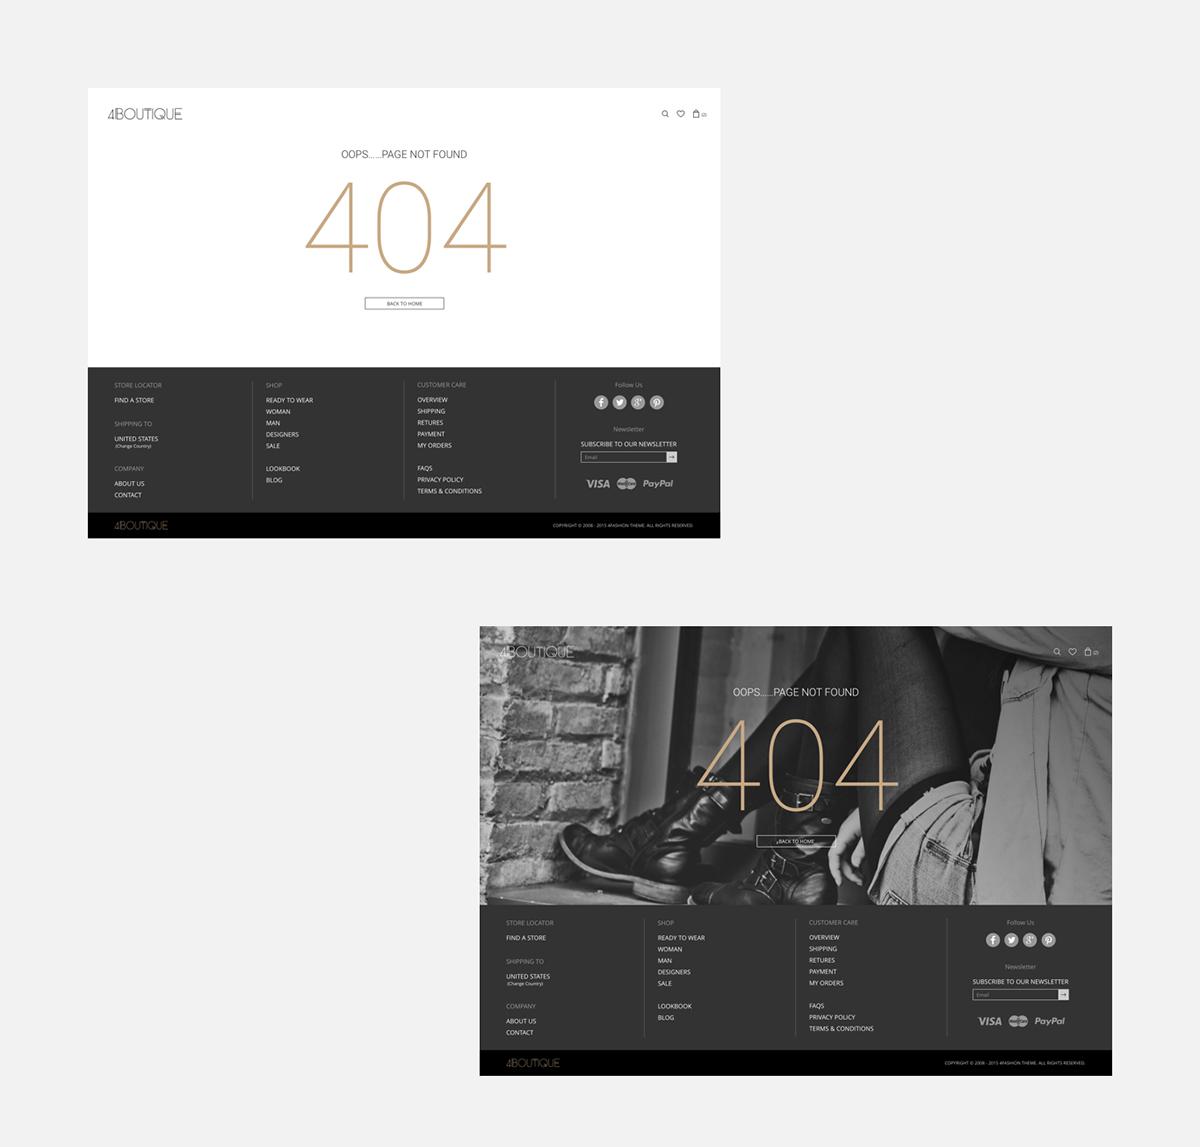 UI ux Ecommerce shop Responsive Website clean elegant sketch photoshop Interface Web mobile tablet interaction